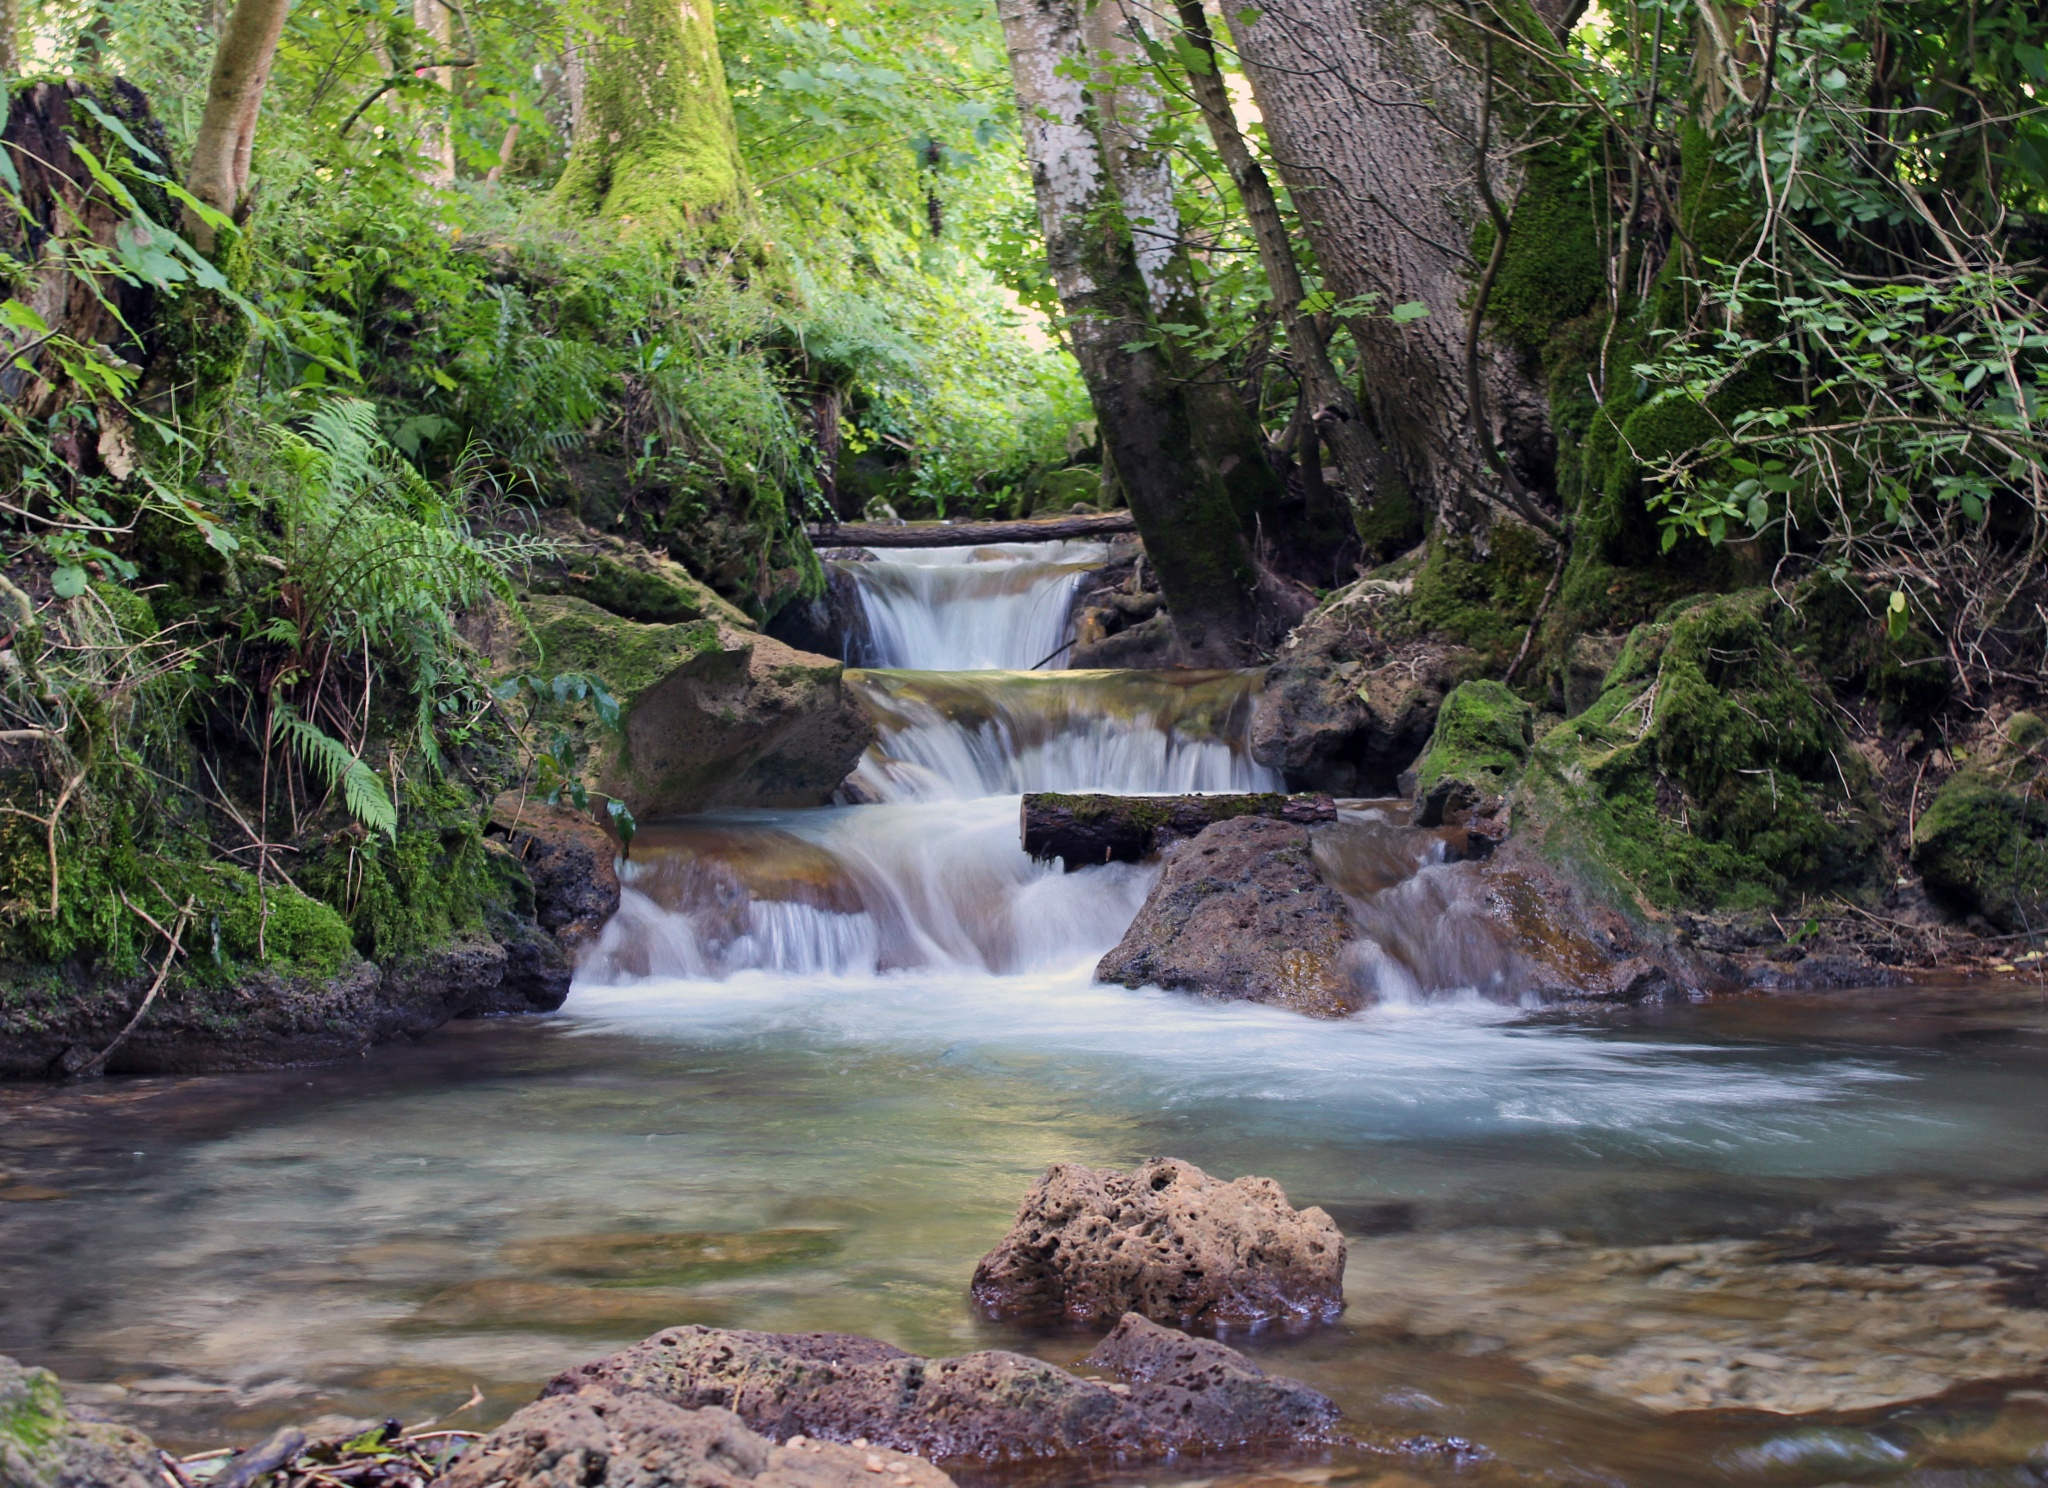 Strange Waters by dirtyharriet